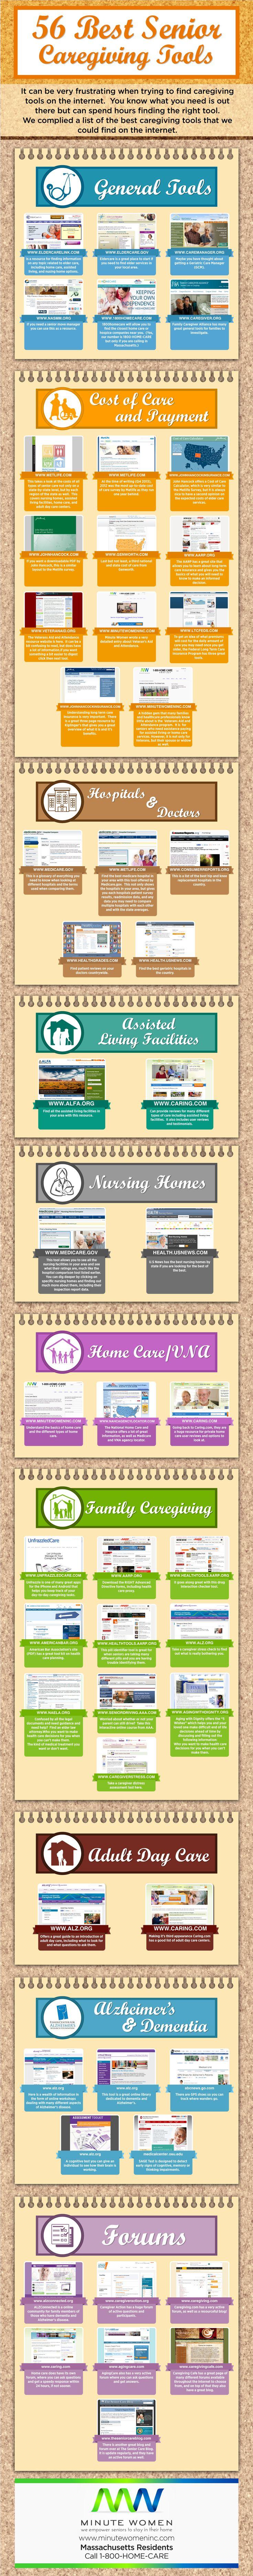 Senior Caregiving Tools #caregiver #caregiving #familycaregiver